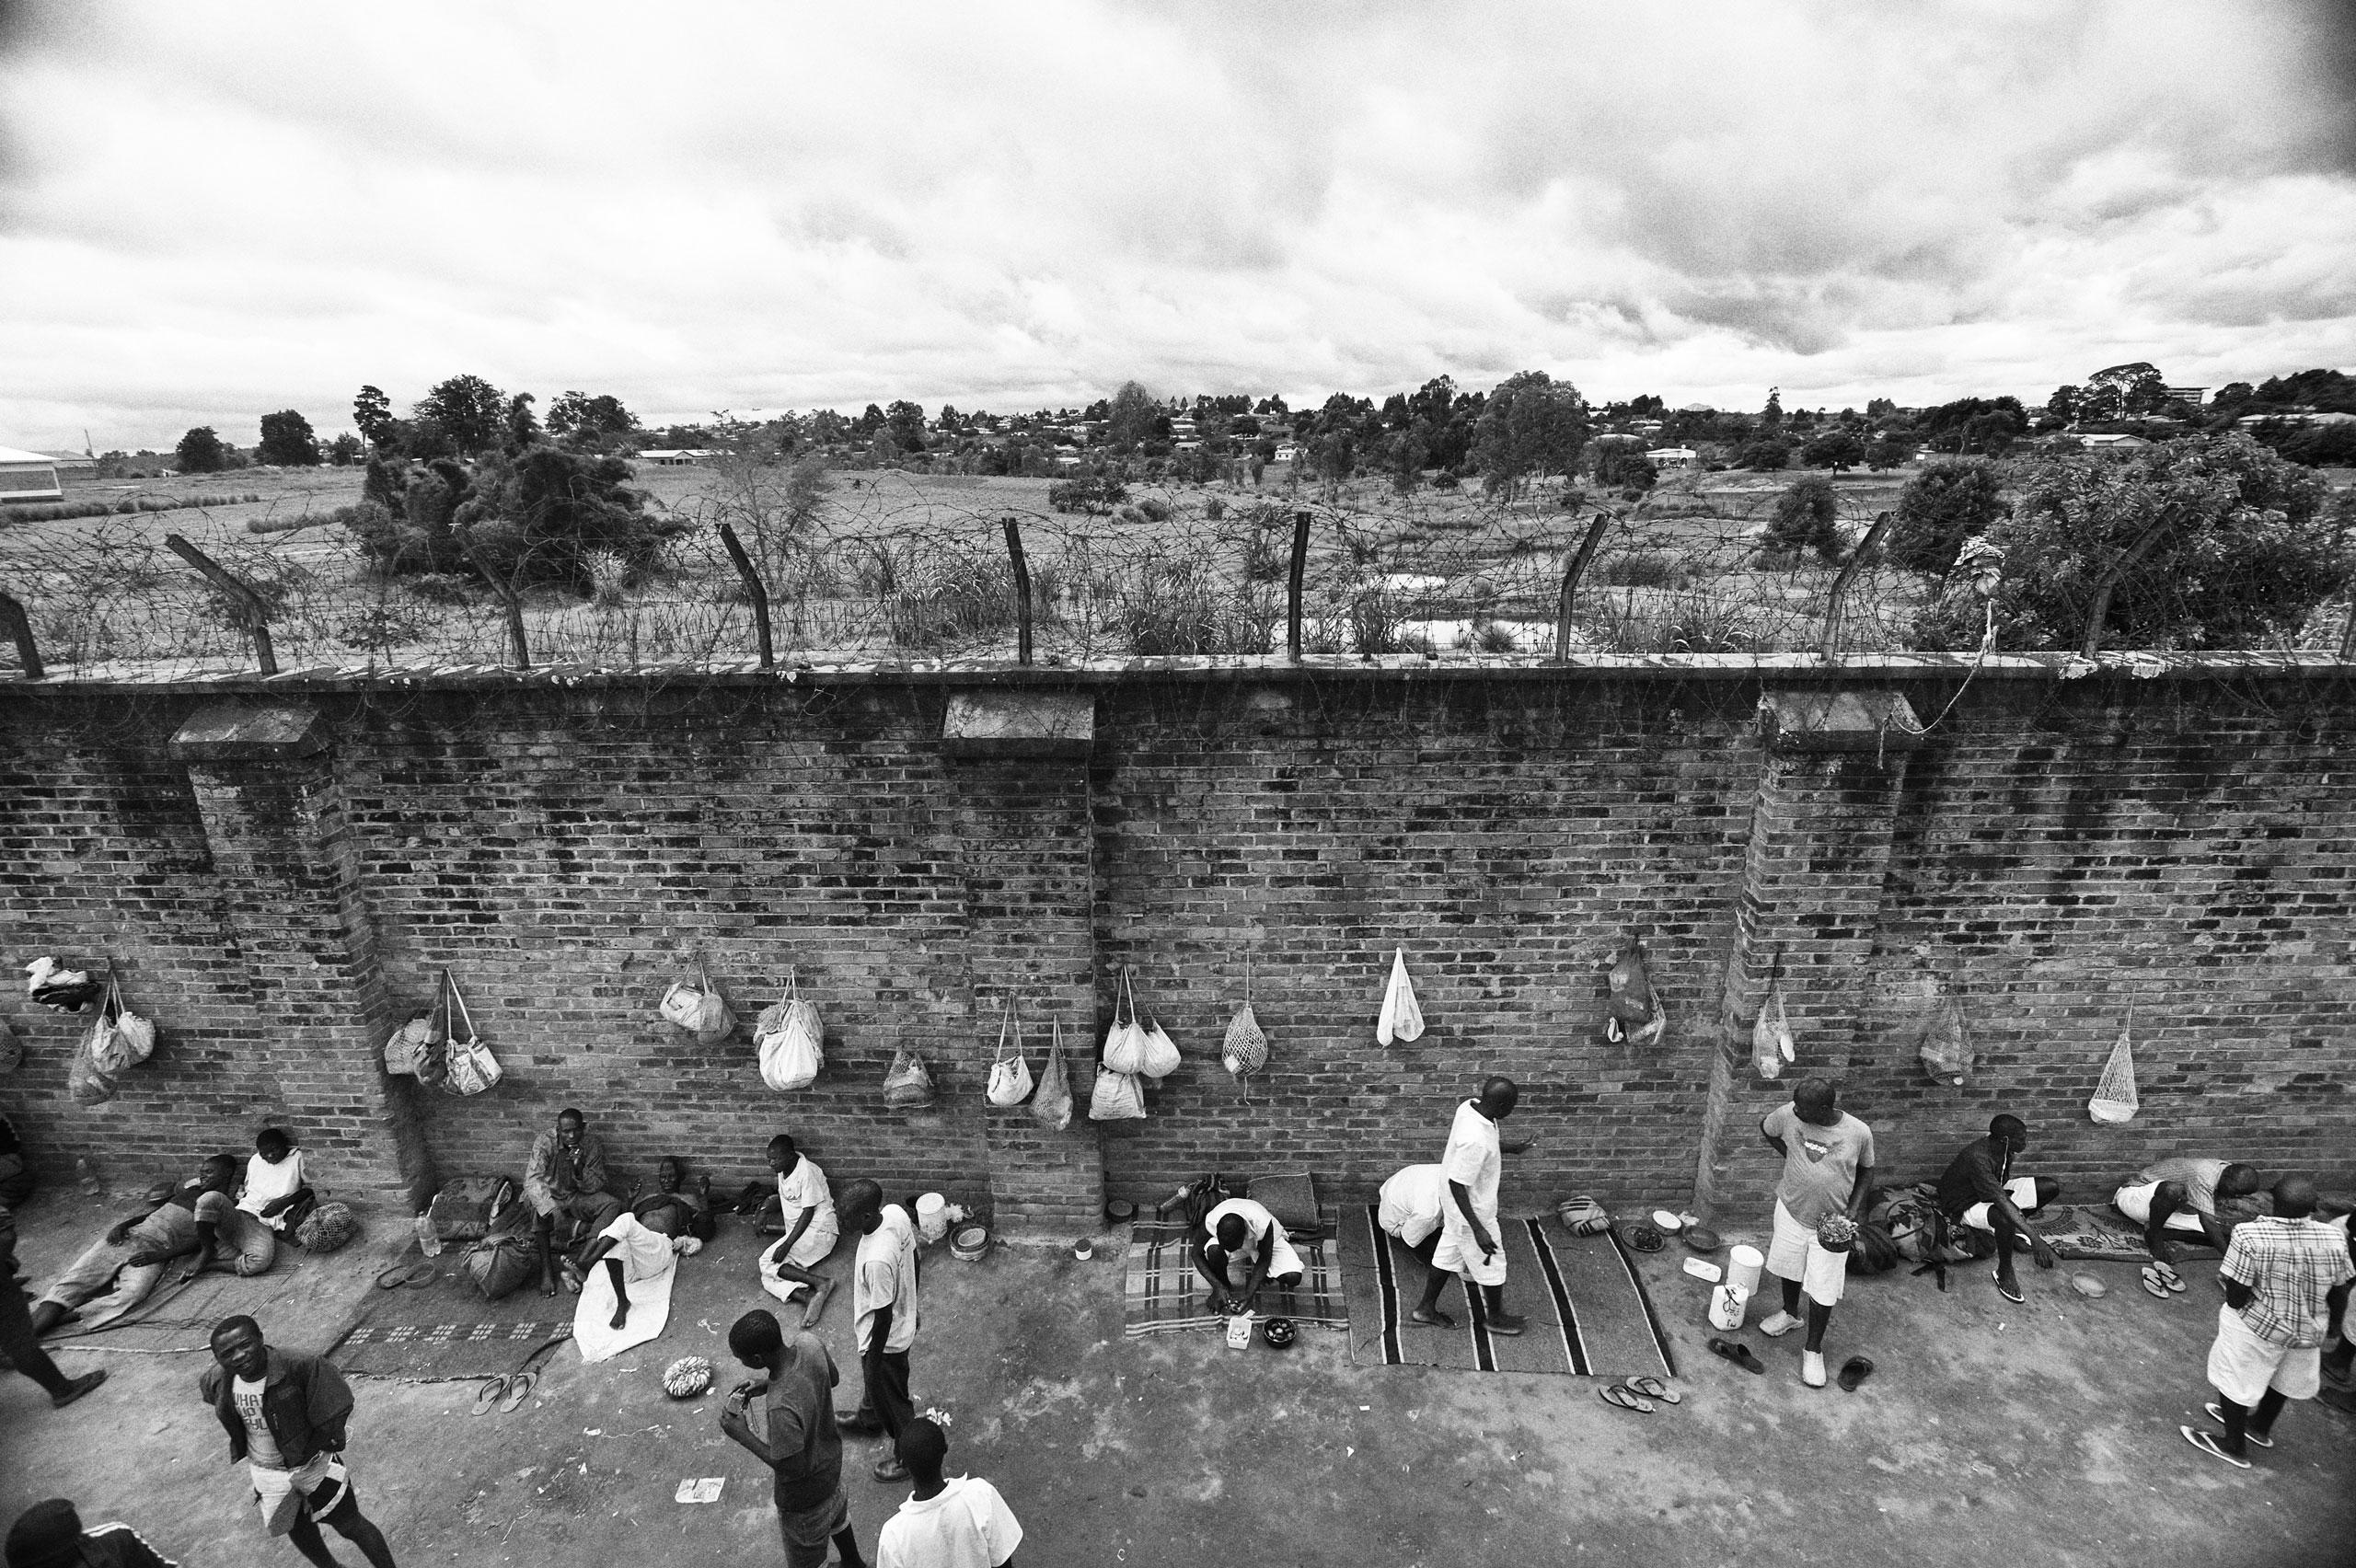 The courtyard of the juvenile prison in Mzuzu, Malawi.